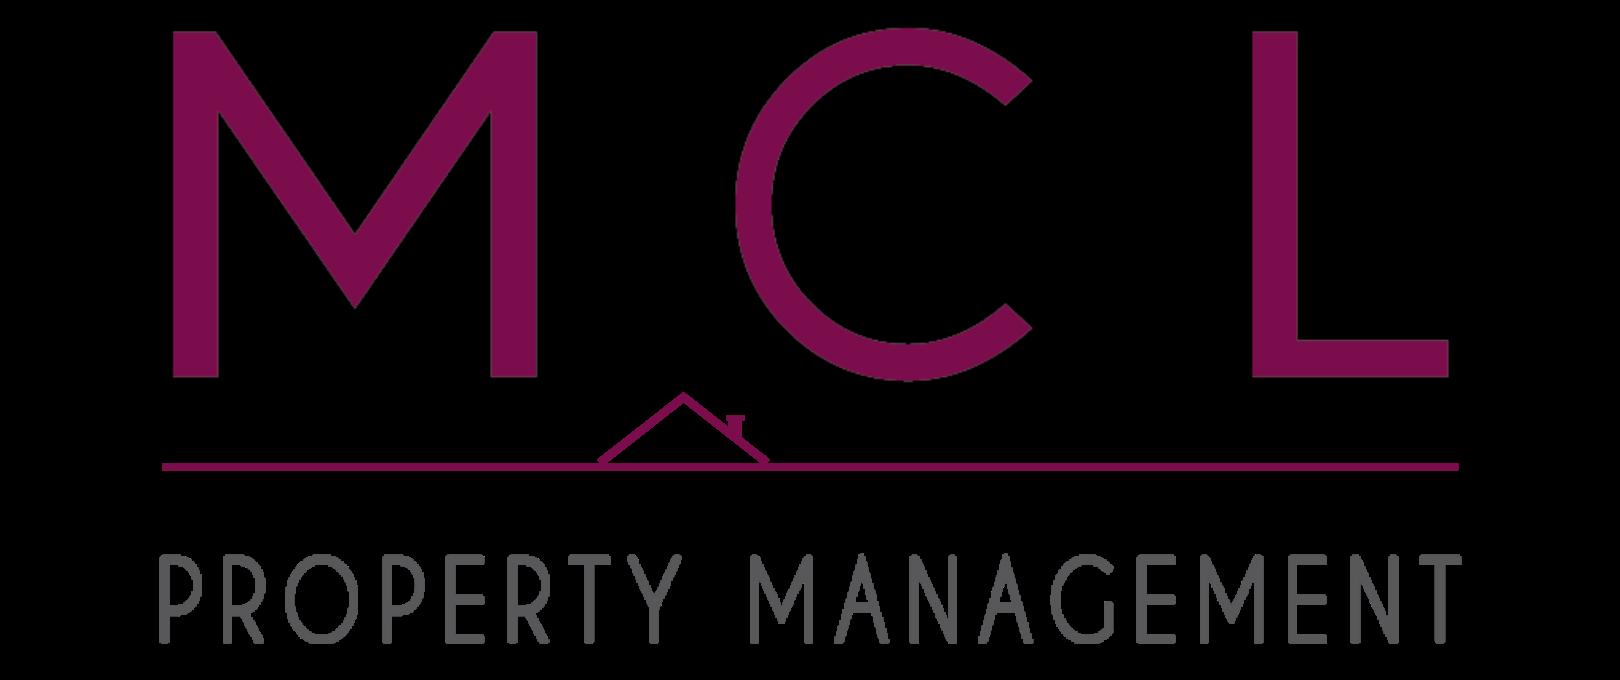 MCL Property Management